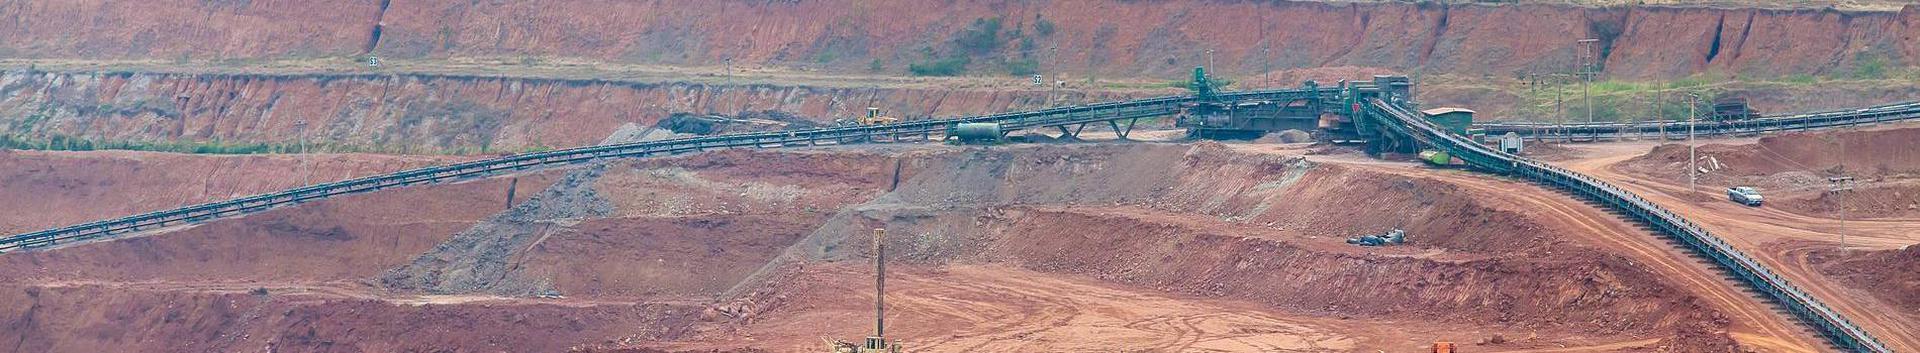 09901_kaevandamise-abitegevused_25665063_xl.jpg